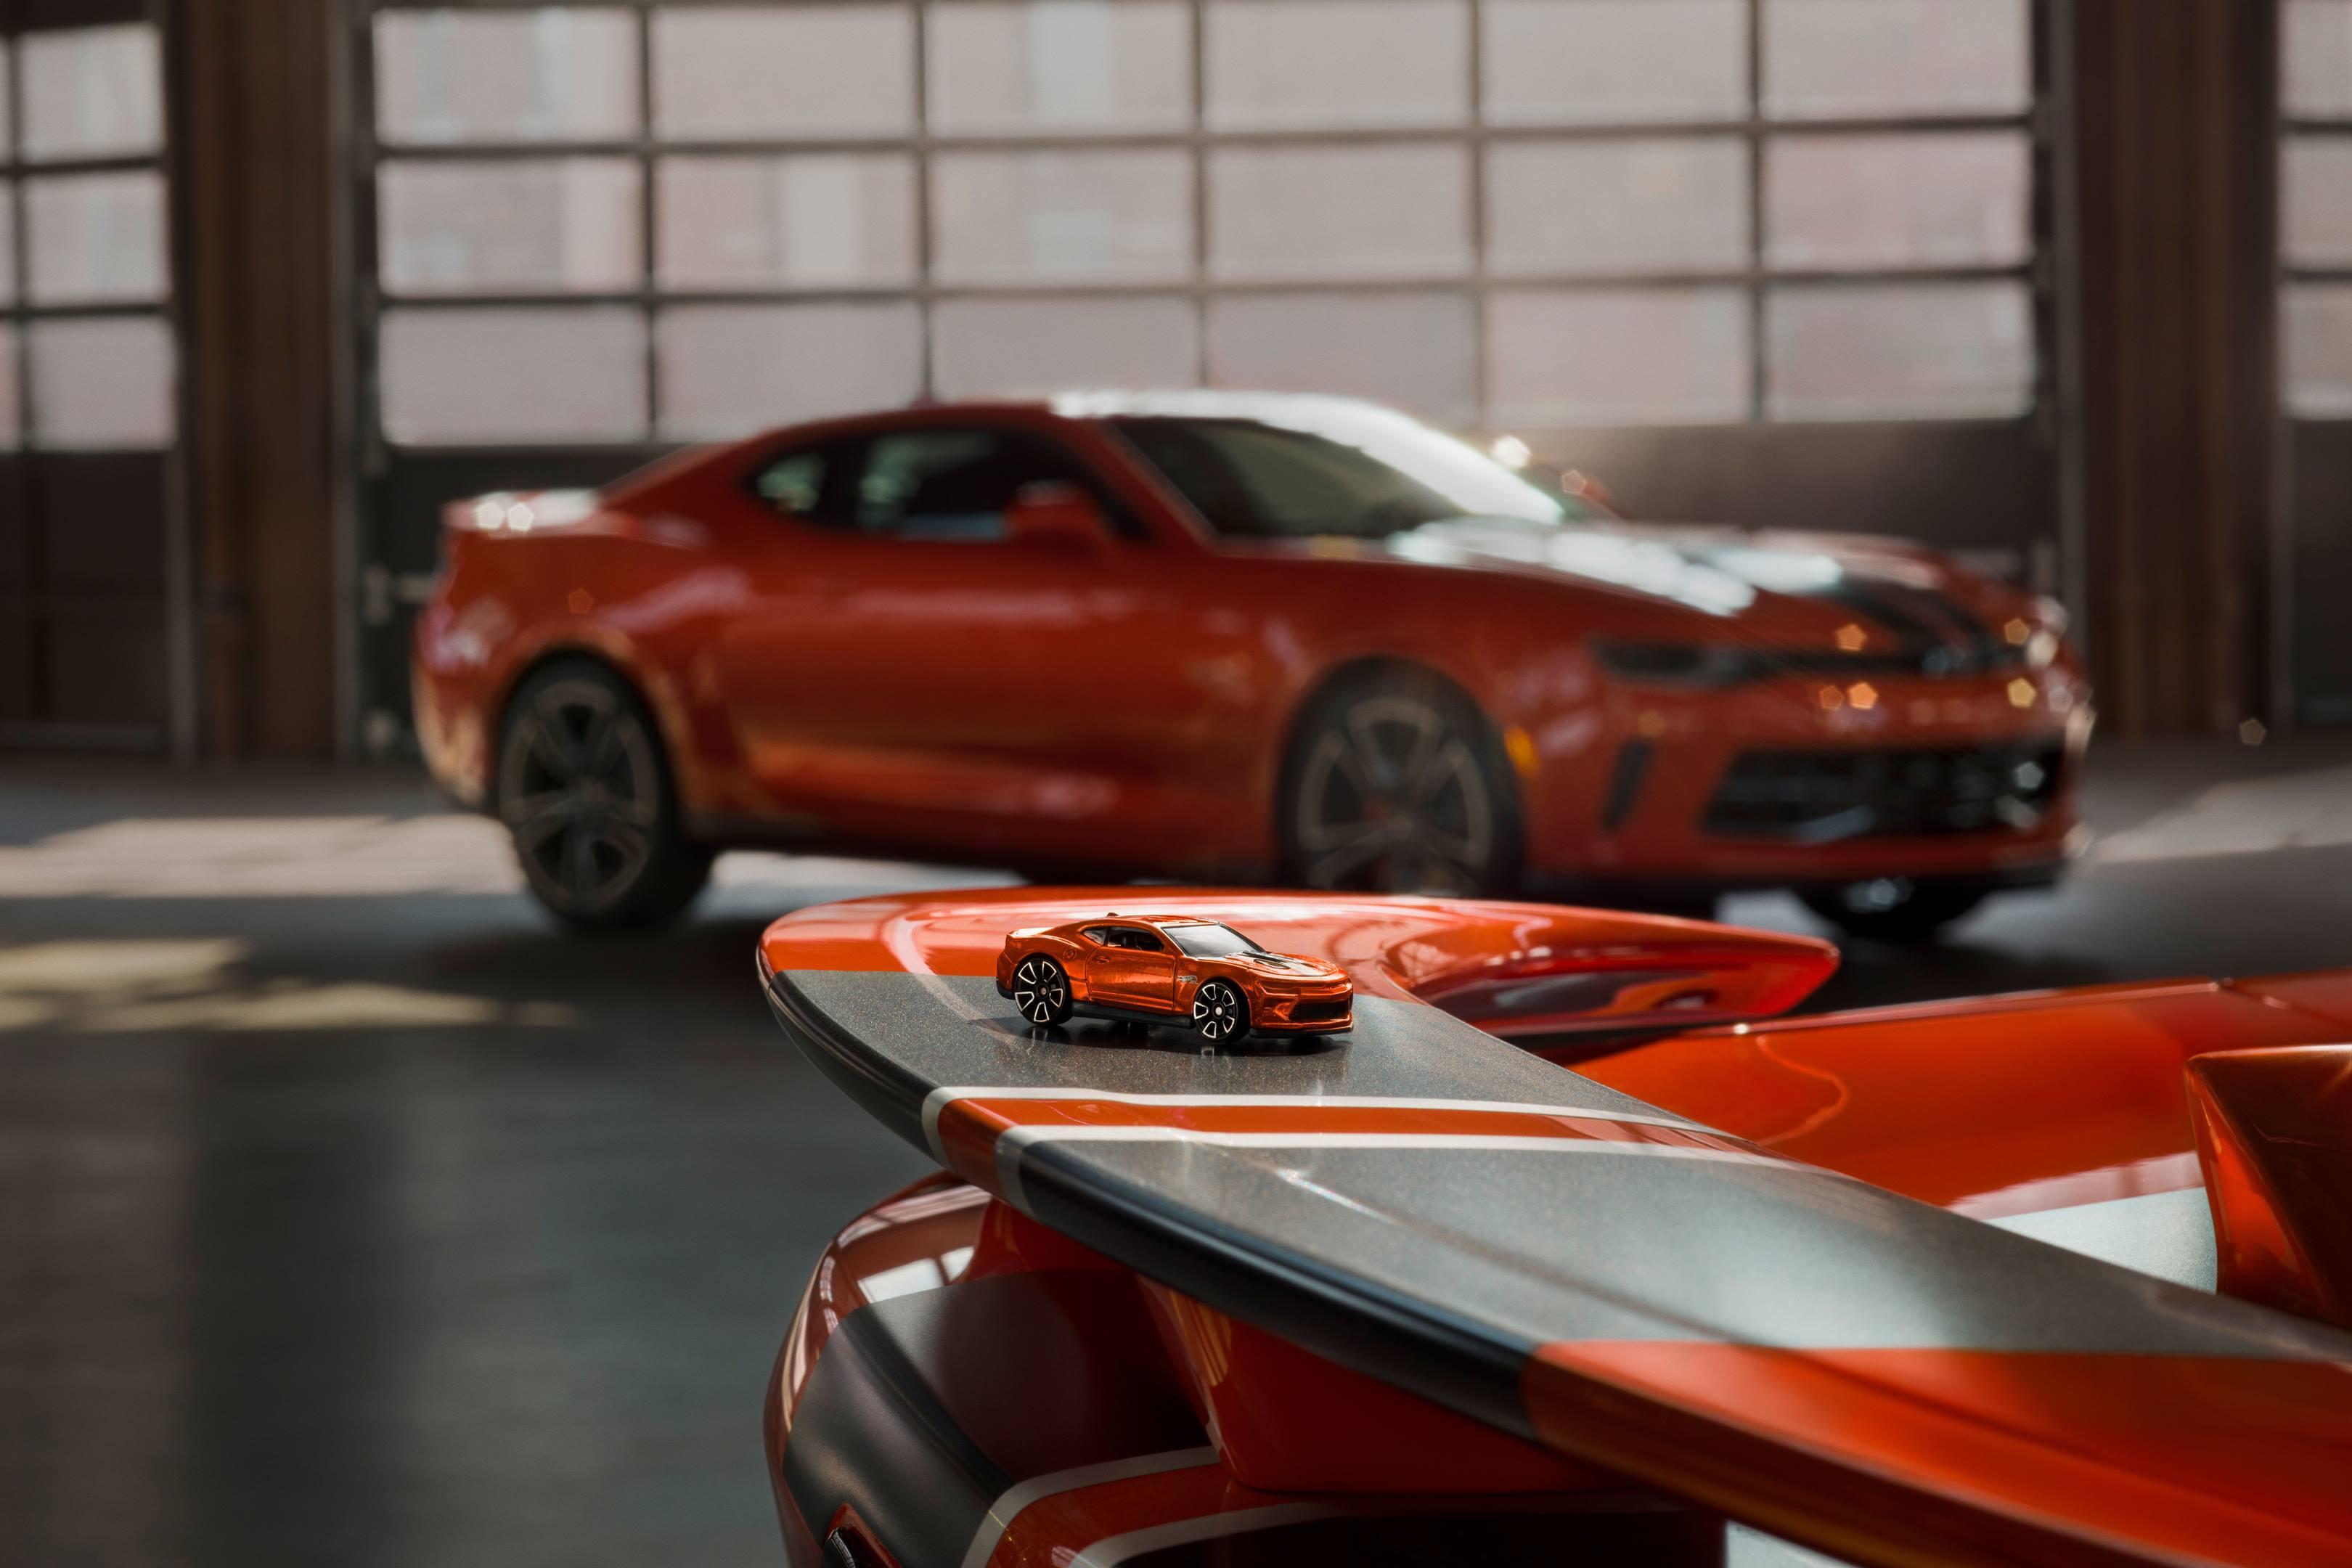 2017 SEMA Chevrolet Hot Wheels Camaro toy